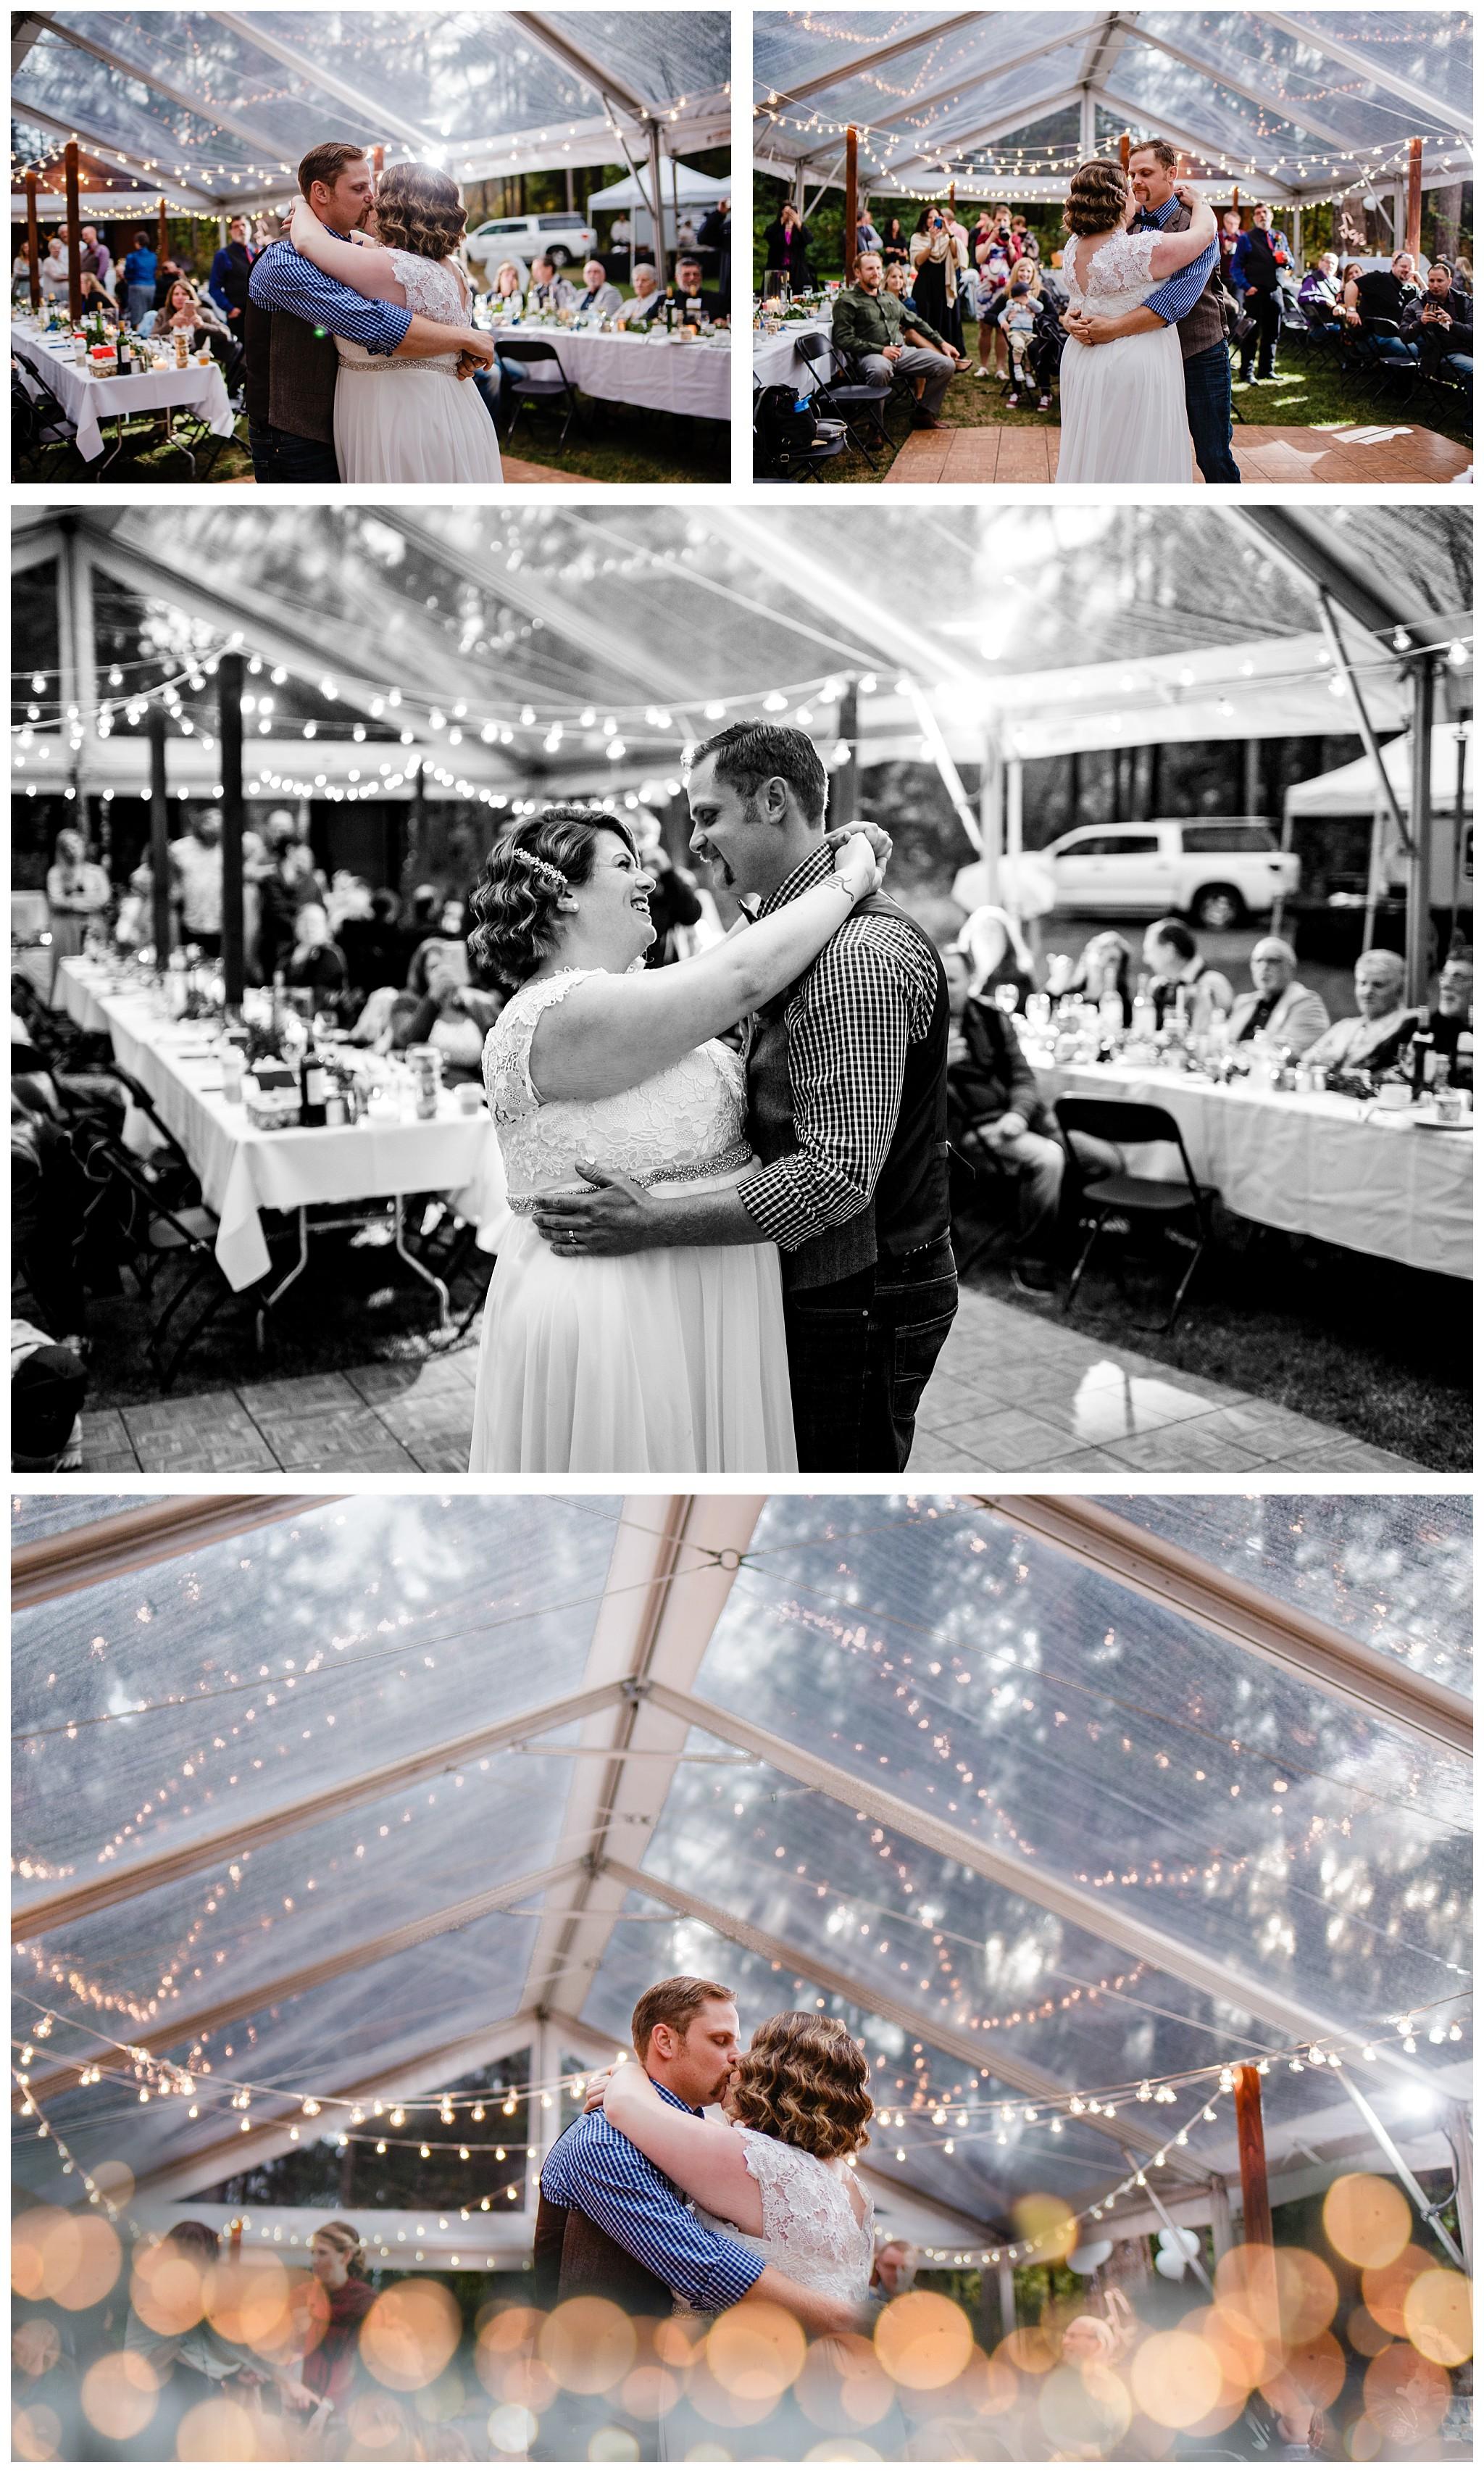 Aldergrove Park Fall Backyard Wedding Photographer Pregnant Bride Tent Outdoor BC Canada Best Wedding Photographer_0051.jpg